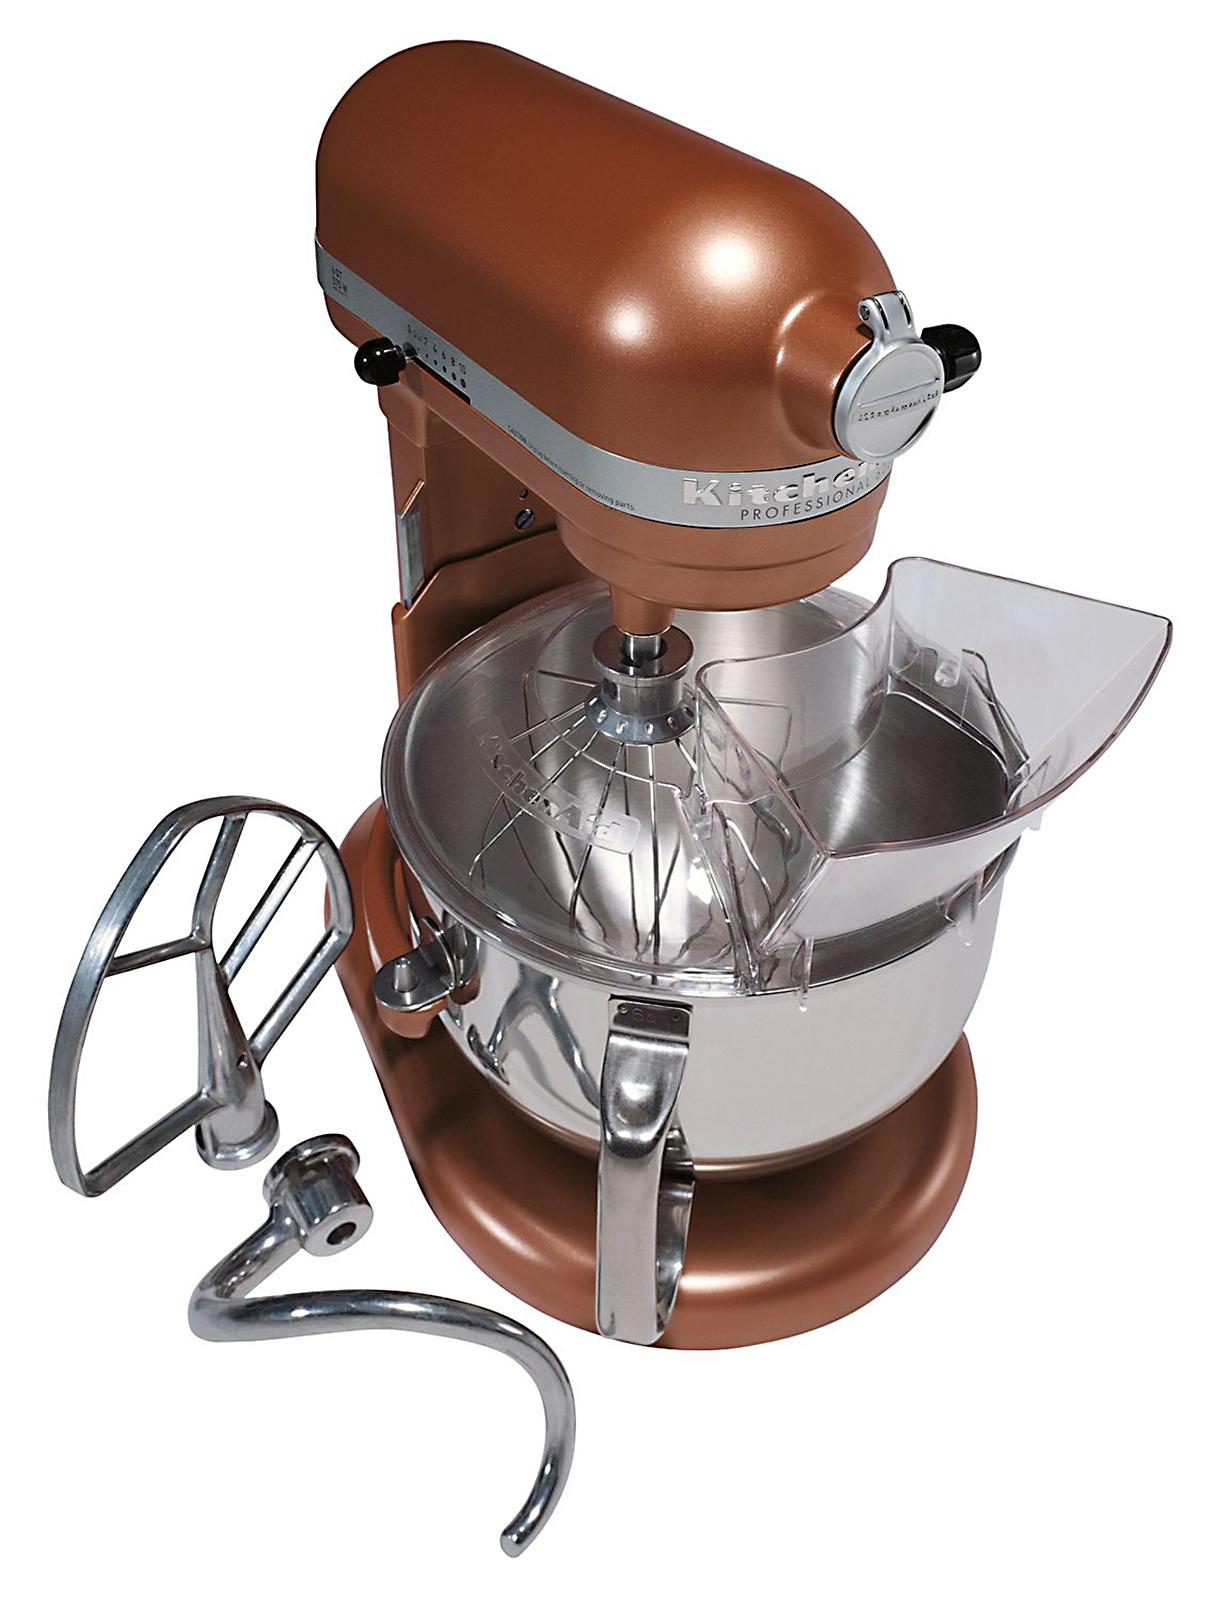 copper kitchen aid mixer sink mats with drain hole kitchenaid kp26m1xce professional 600 series 6 quart stand